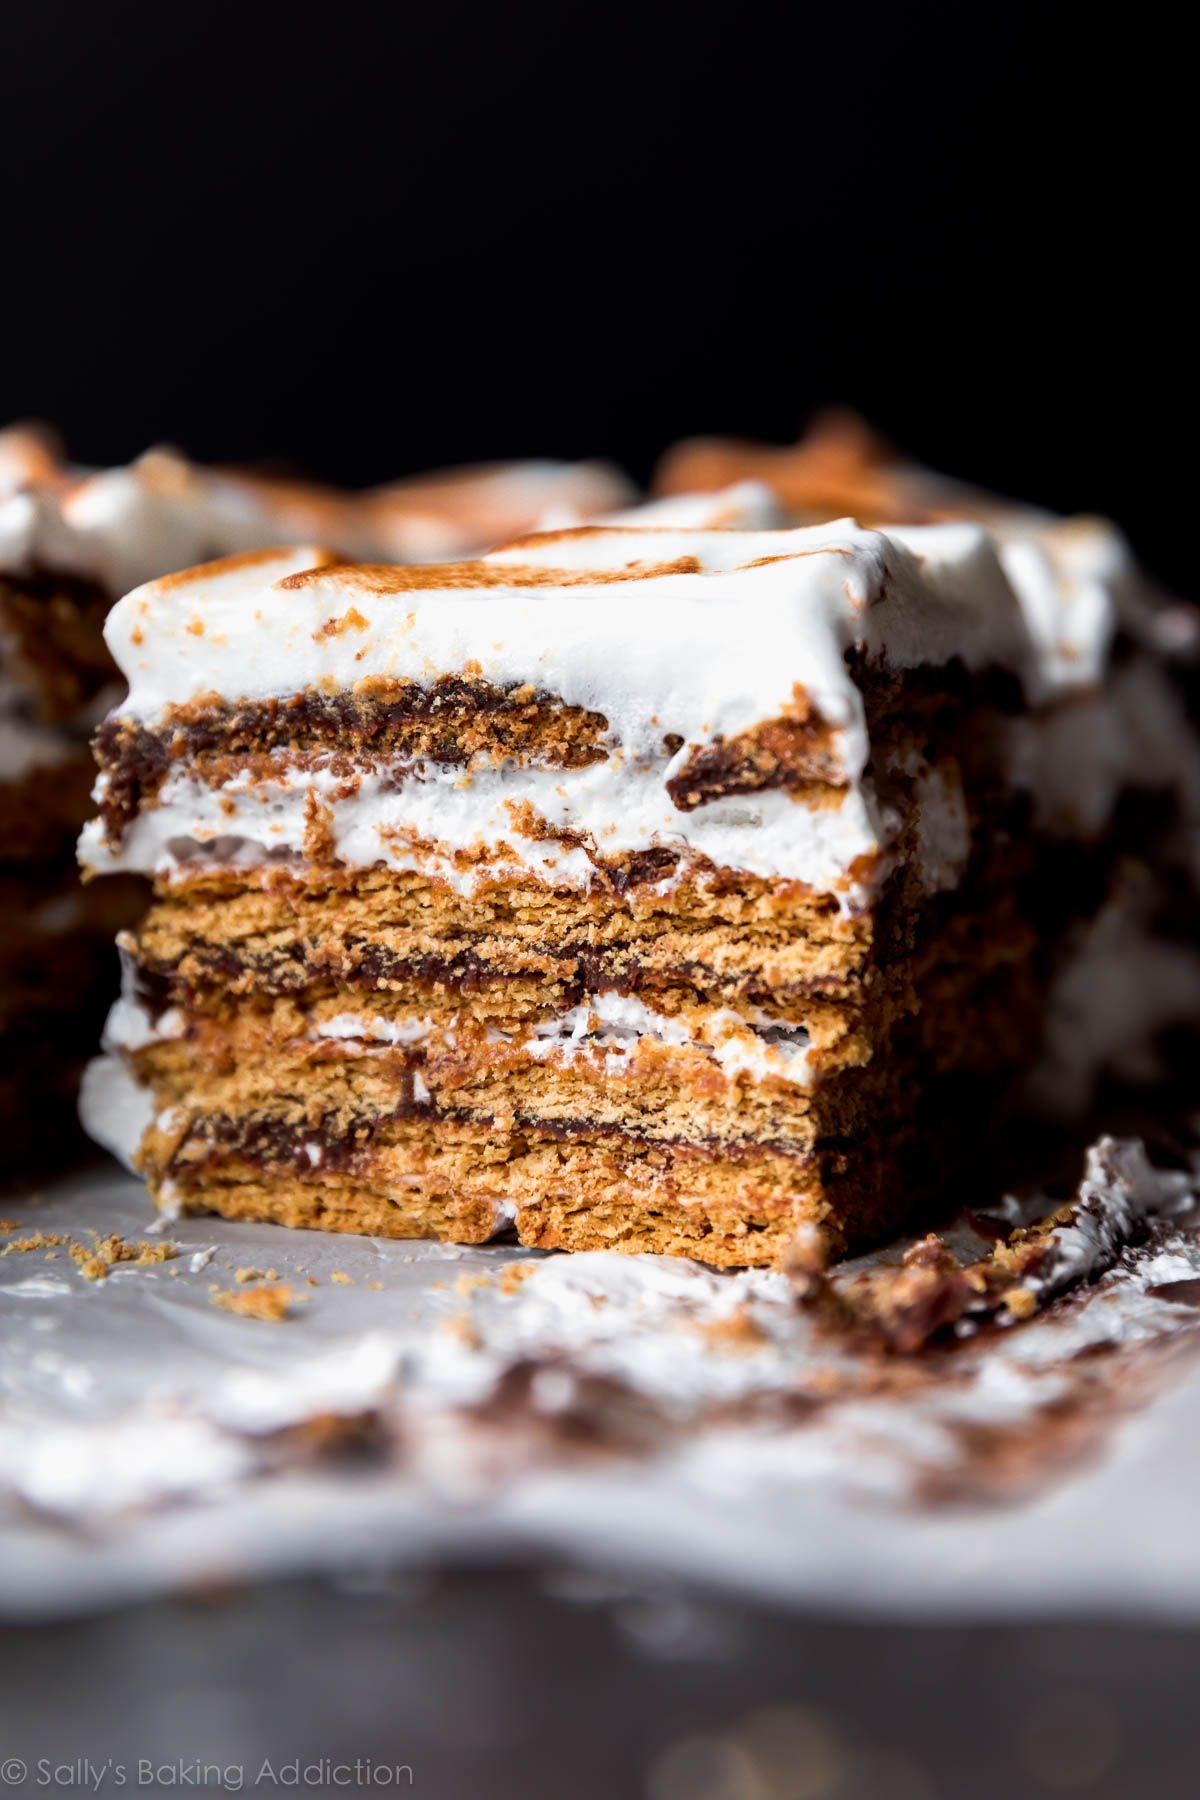 46 Easy No-Bake Desserts - Best Recipes for No Bake Treats